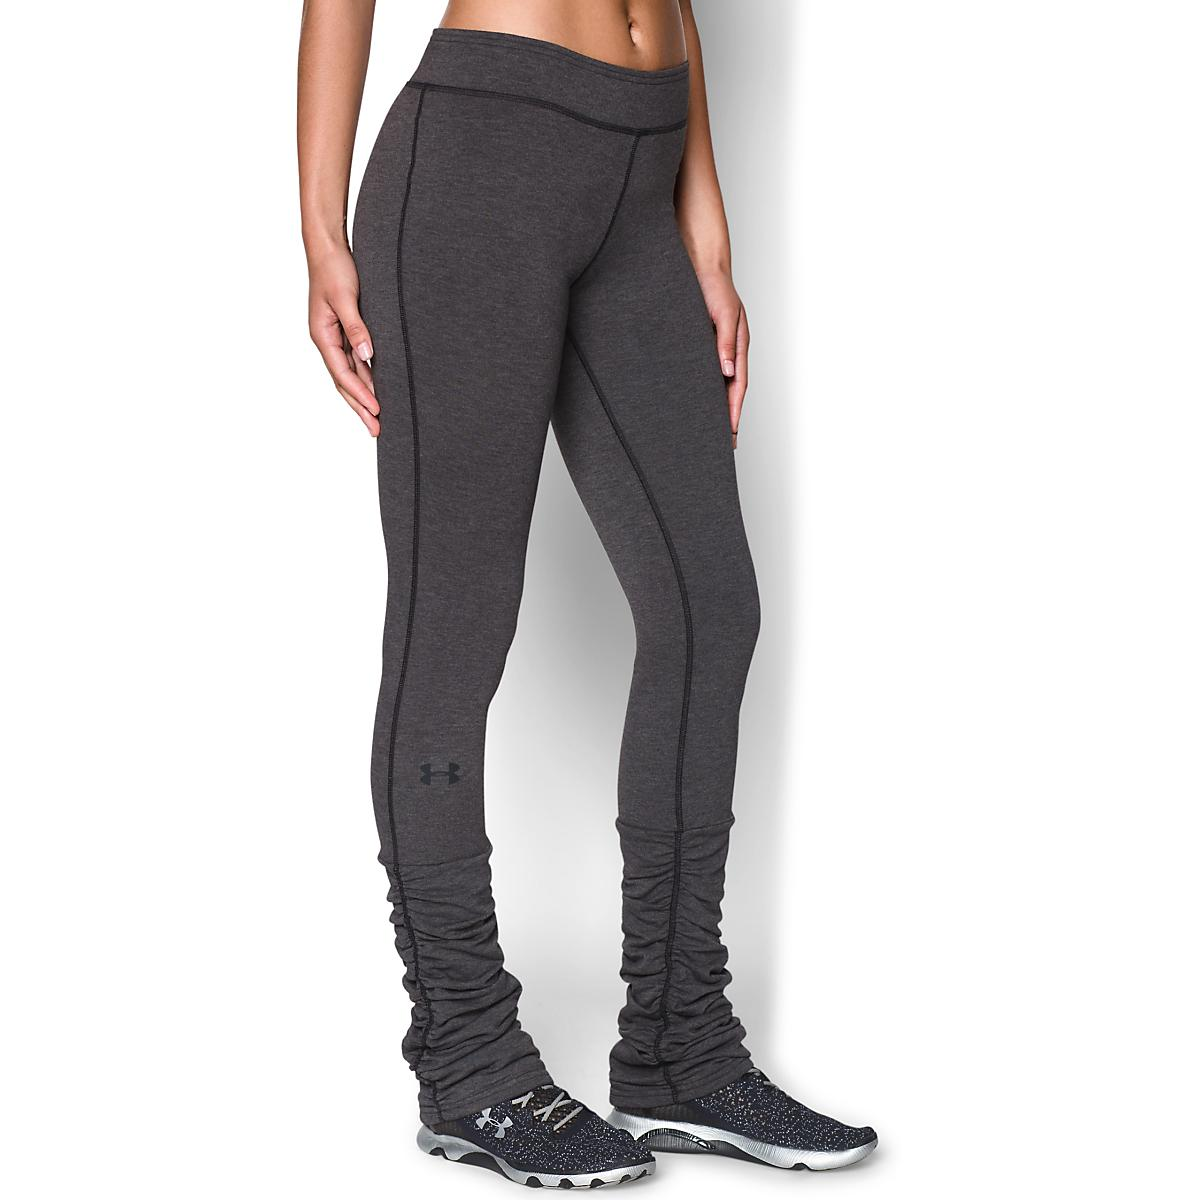 Women's Under Armour�ColdGear Infrared Legwarmer Pant